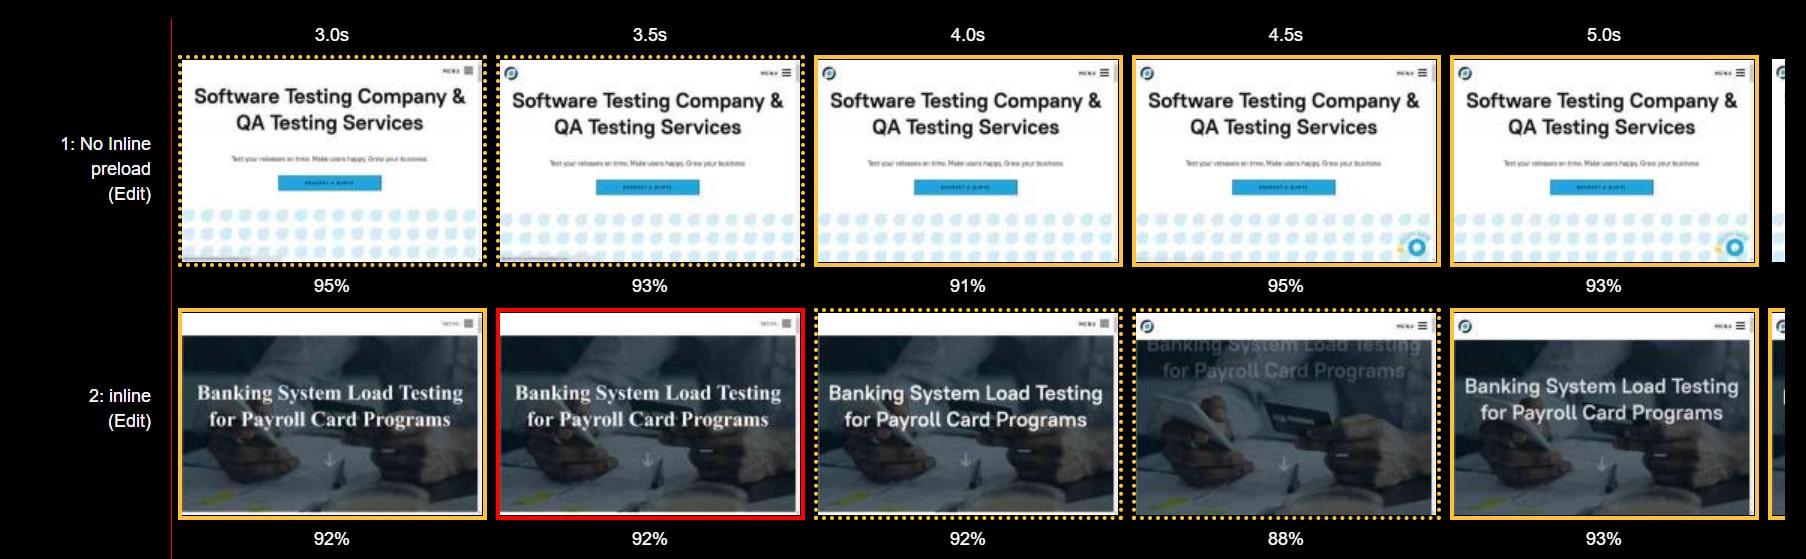 A screenshot of the WebPageTest report